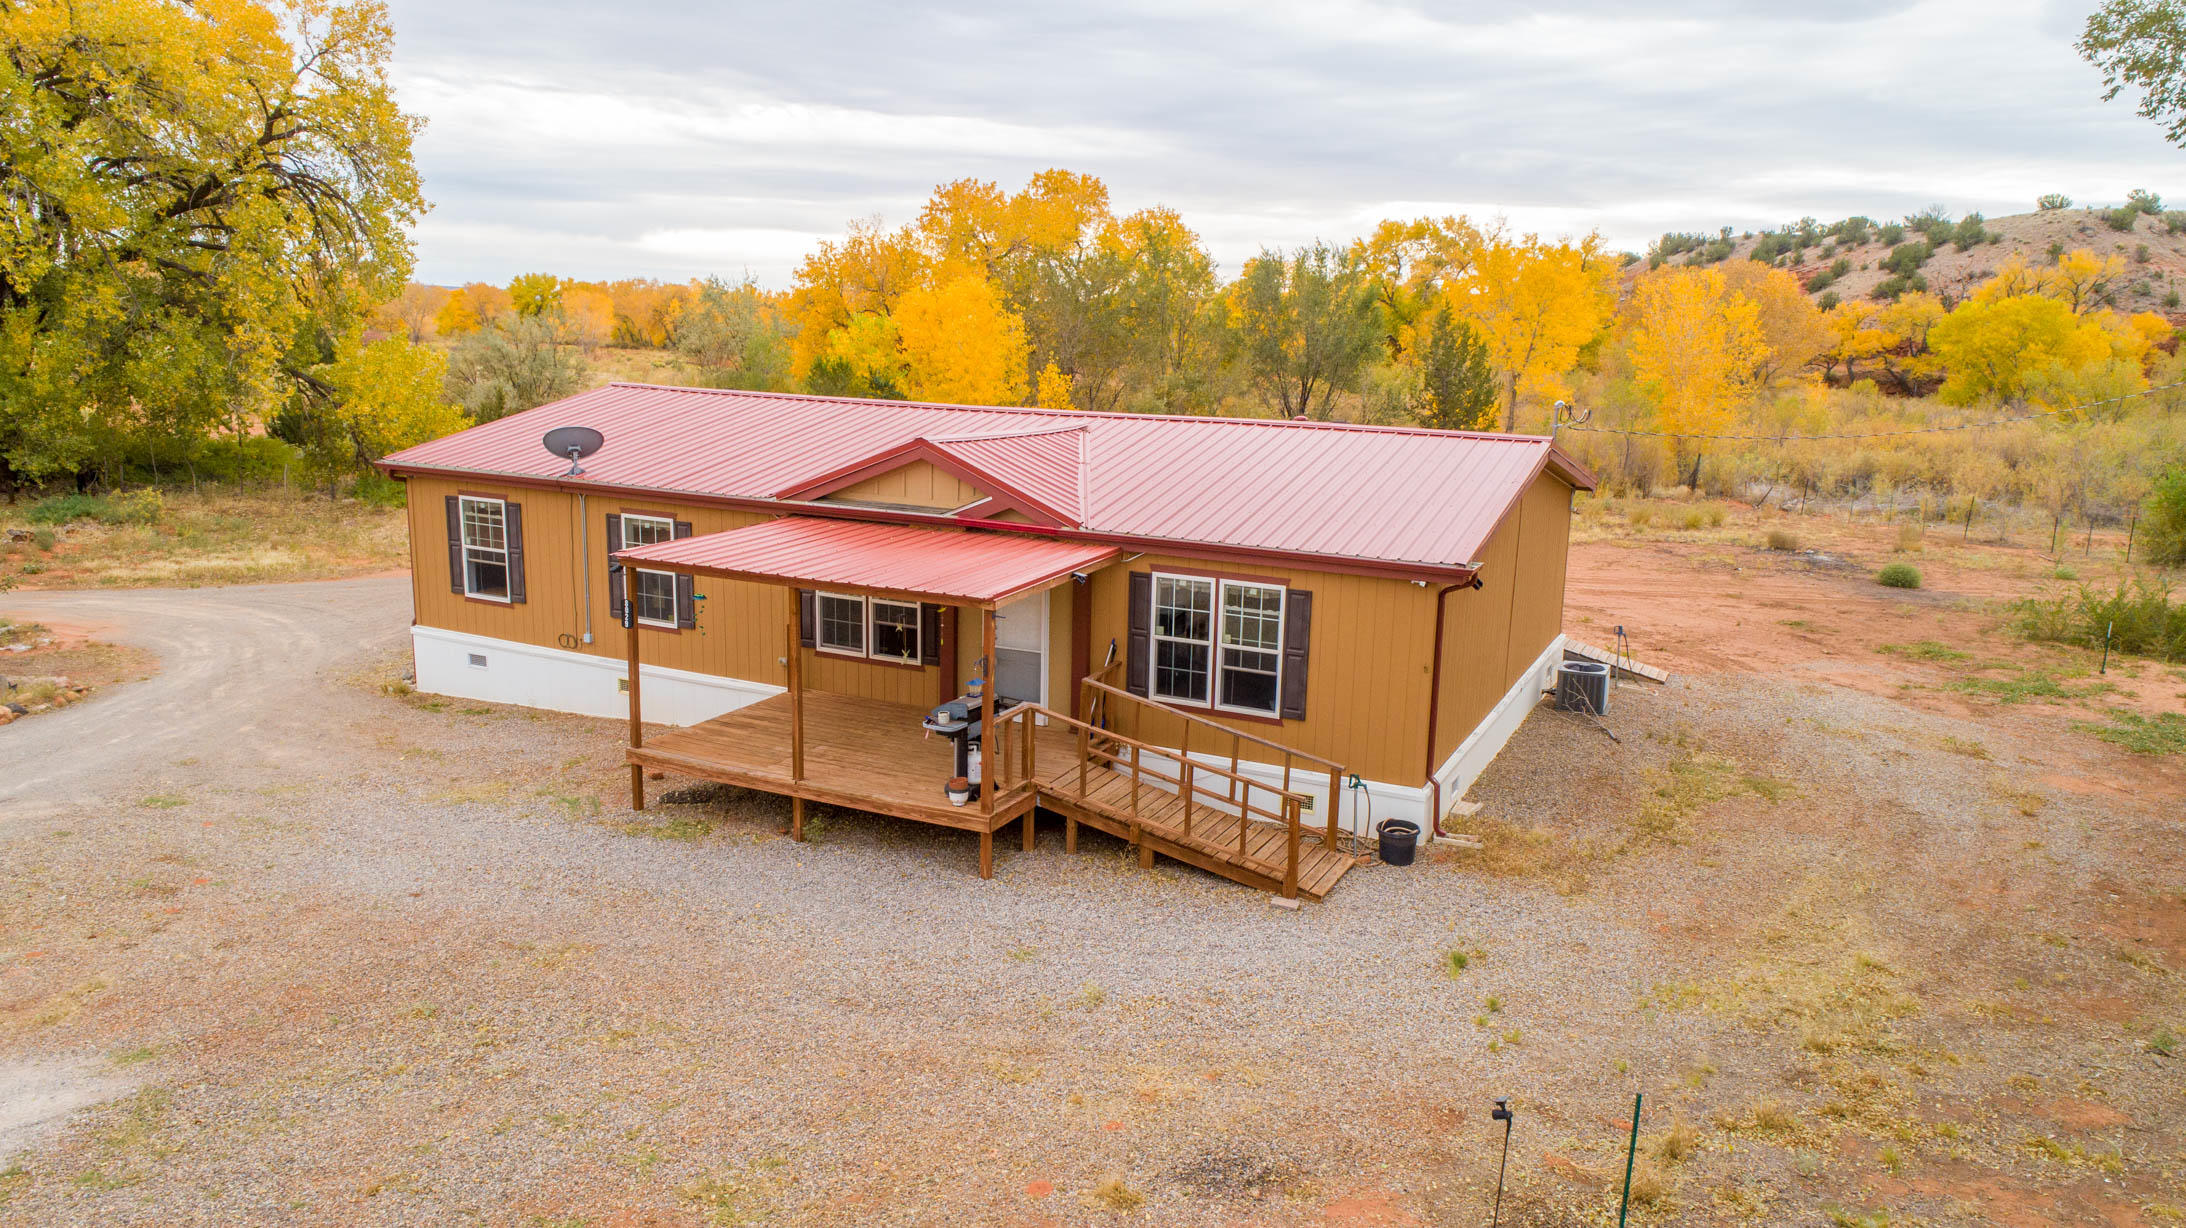 8029 HIGHWAY 4 Property Photo - Jemez Pueblo, NM real estate listing